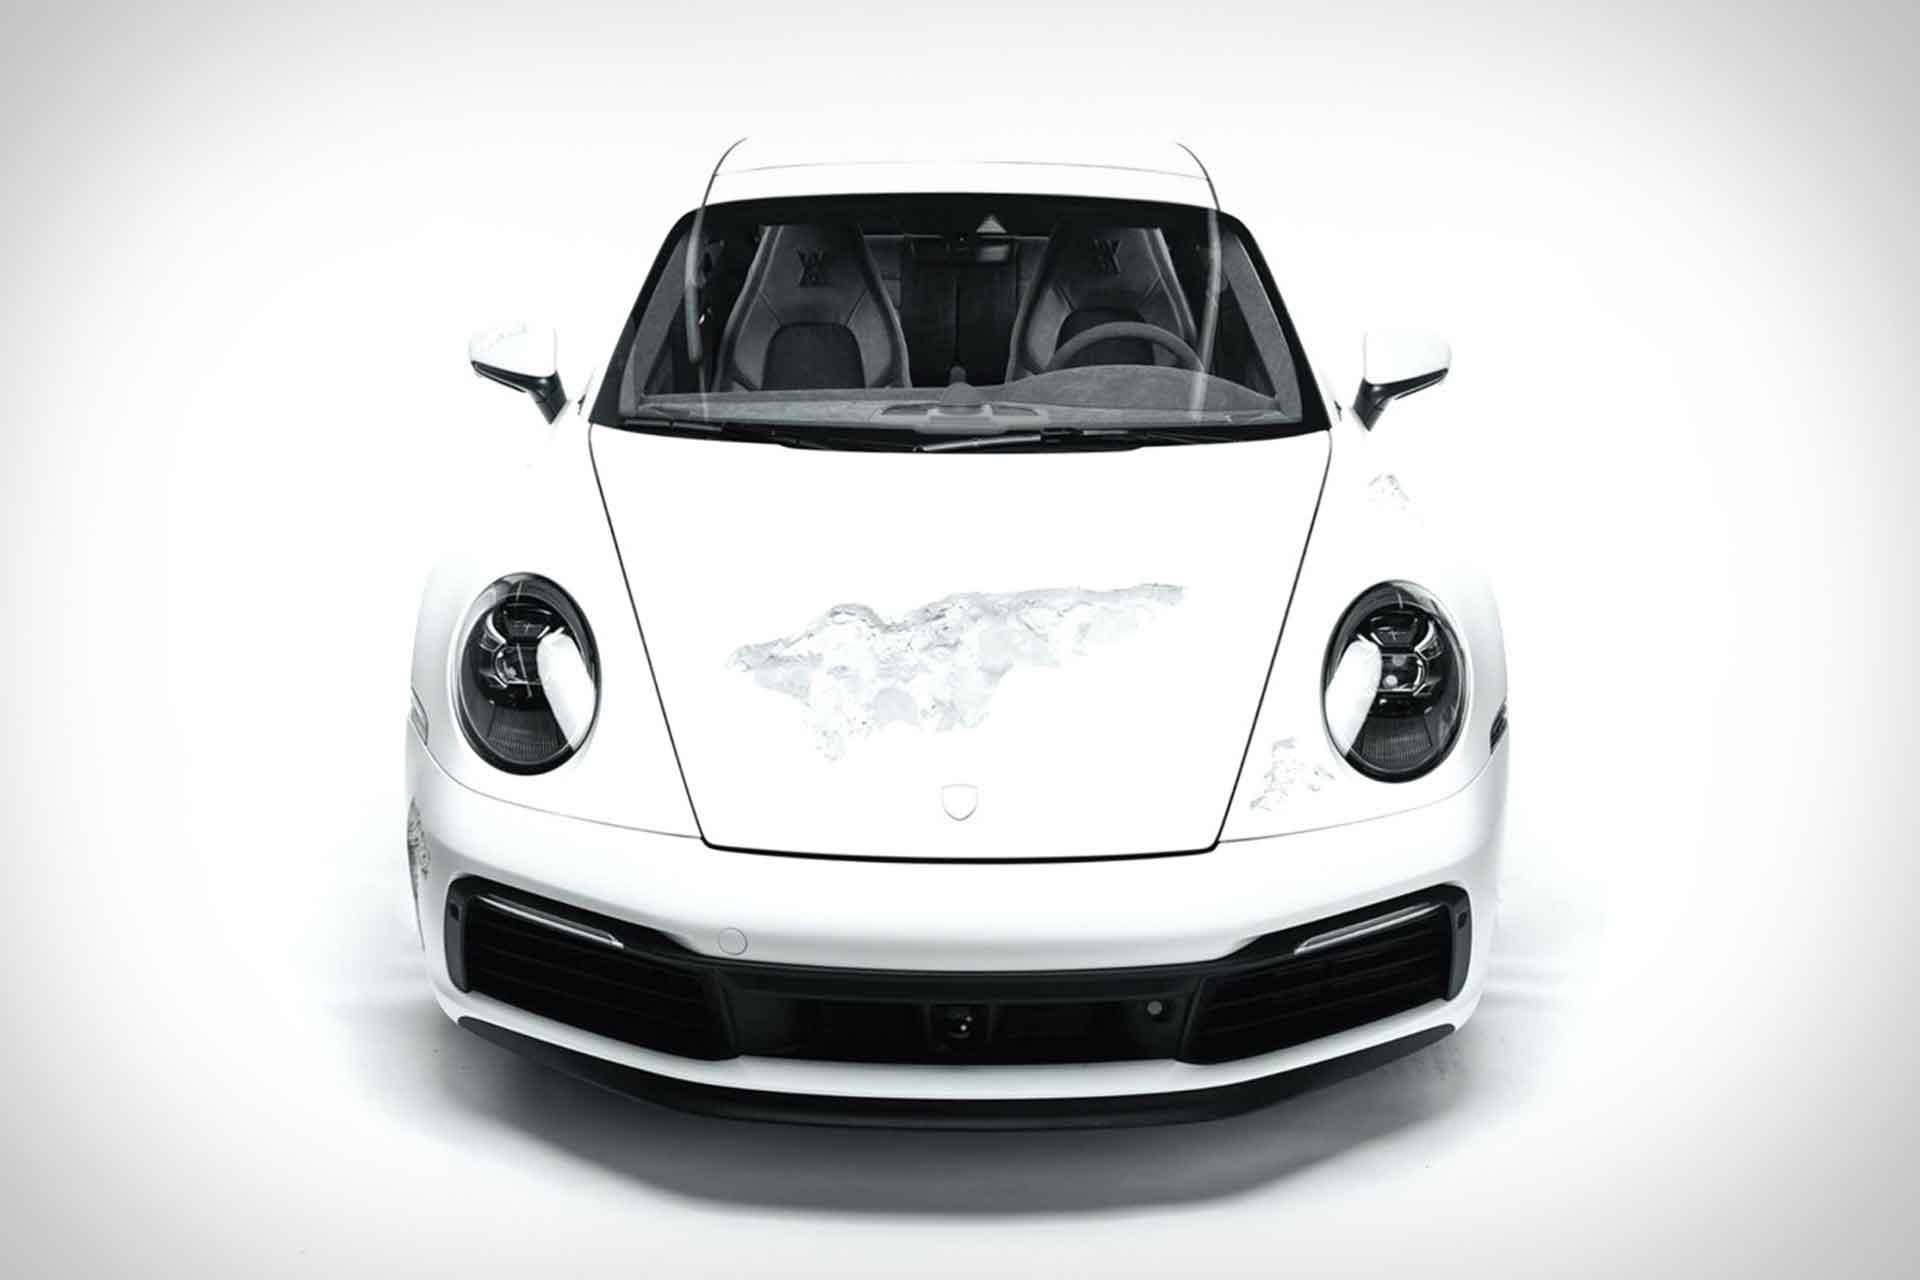 Daniel Arsham x Selfridges Eroded Porsche 911 Coupe